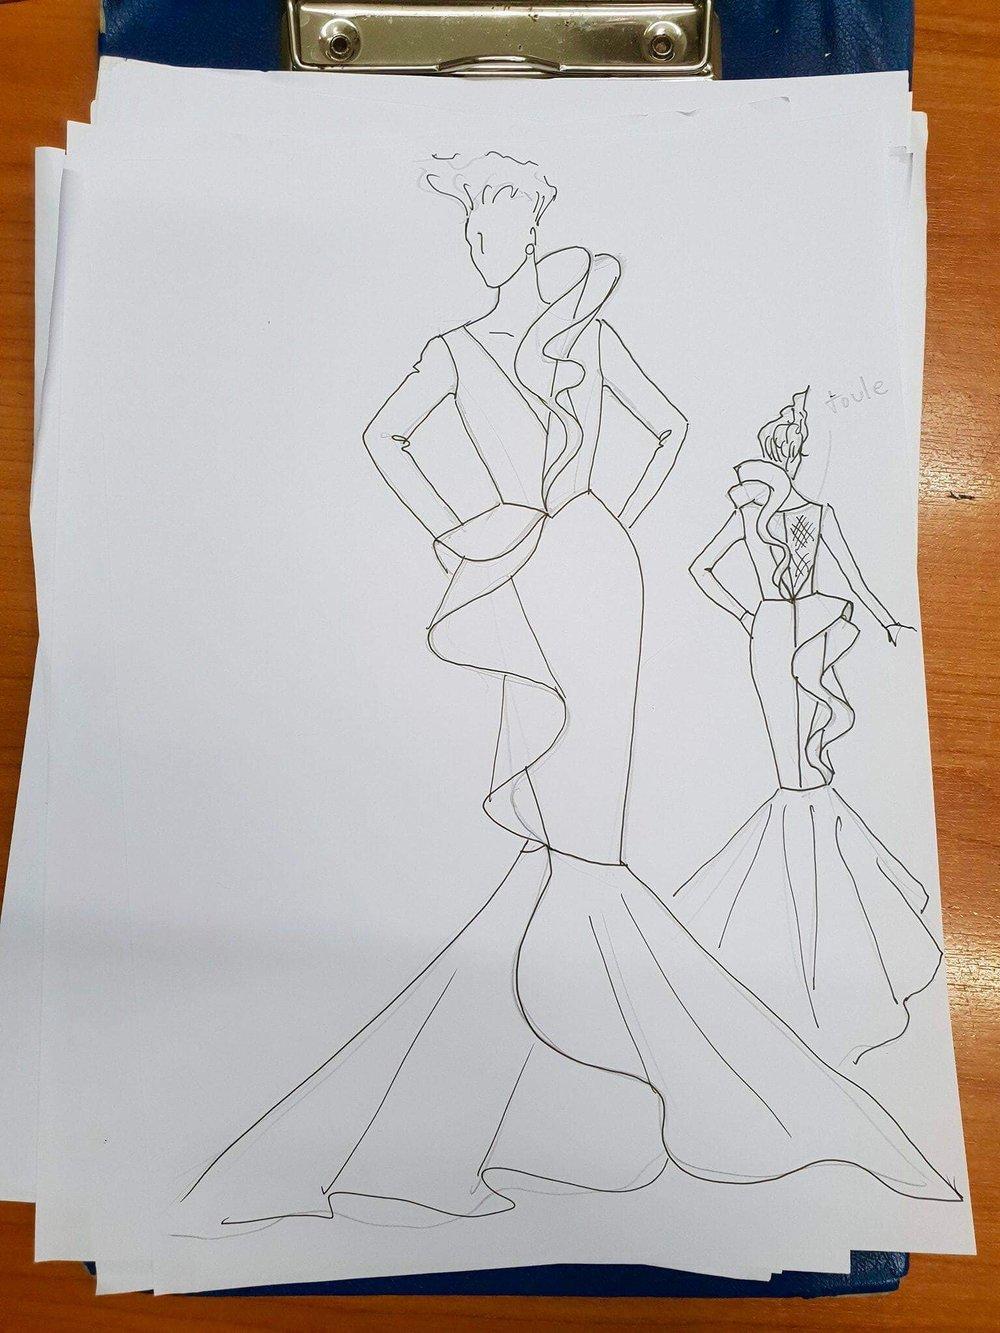 Sketch.jpeg